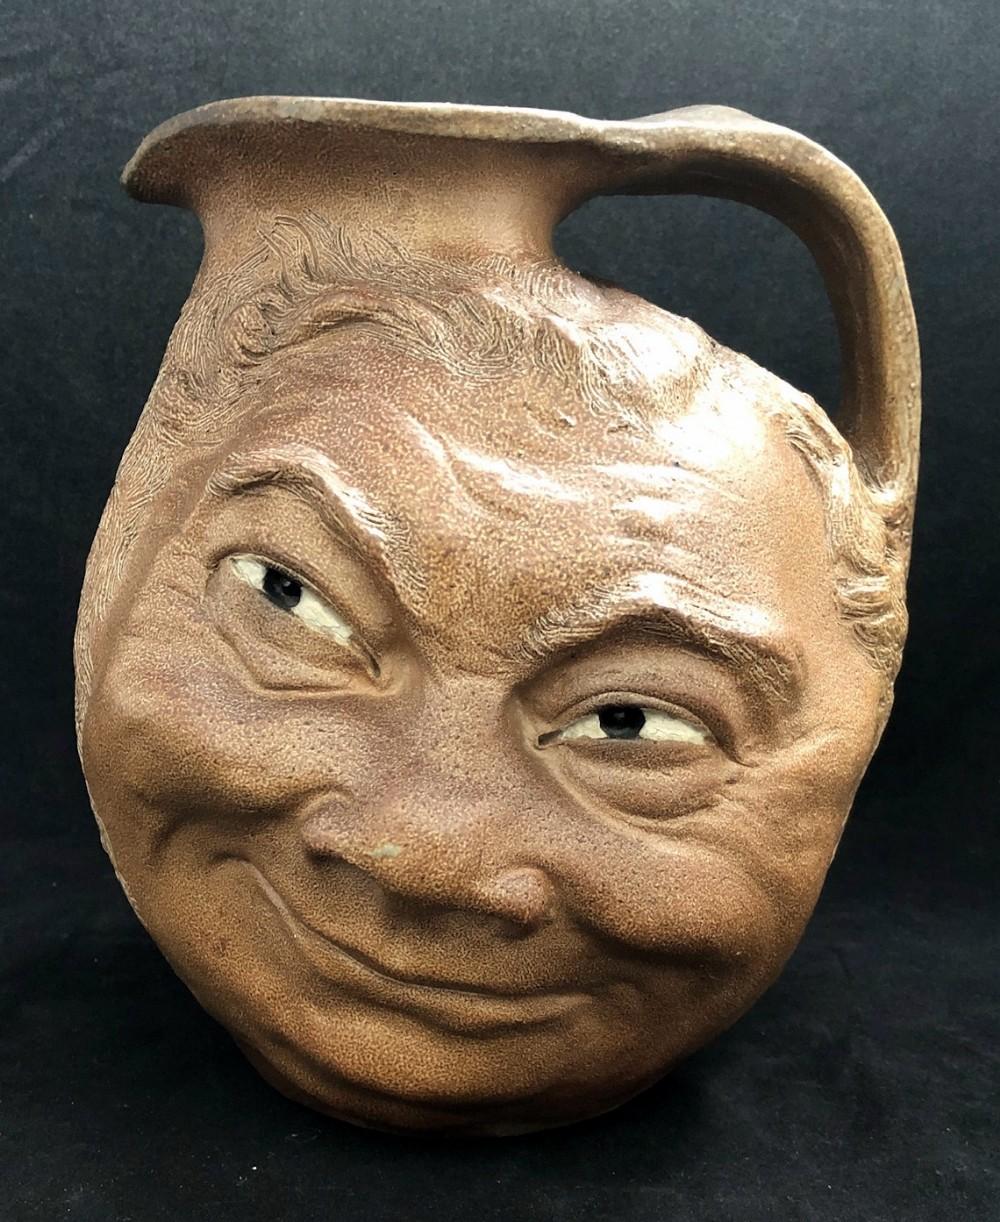 martin brothers large face jug